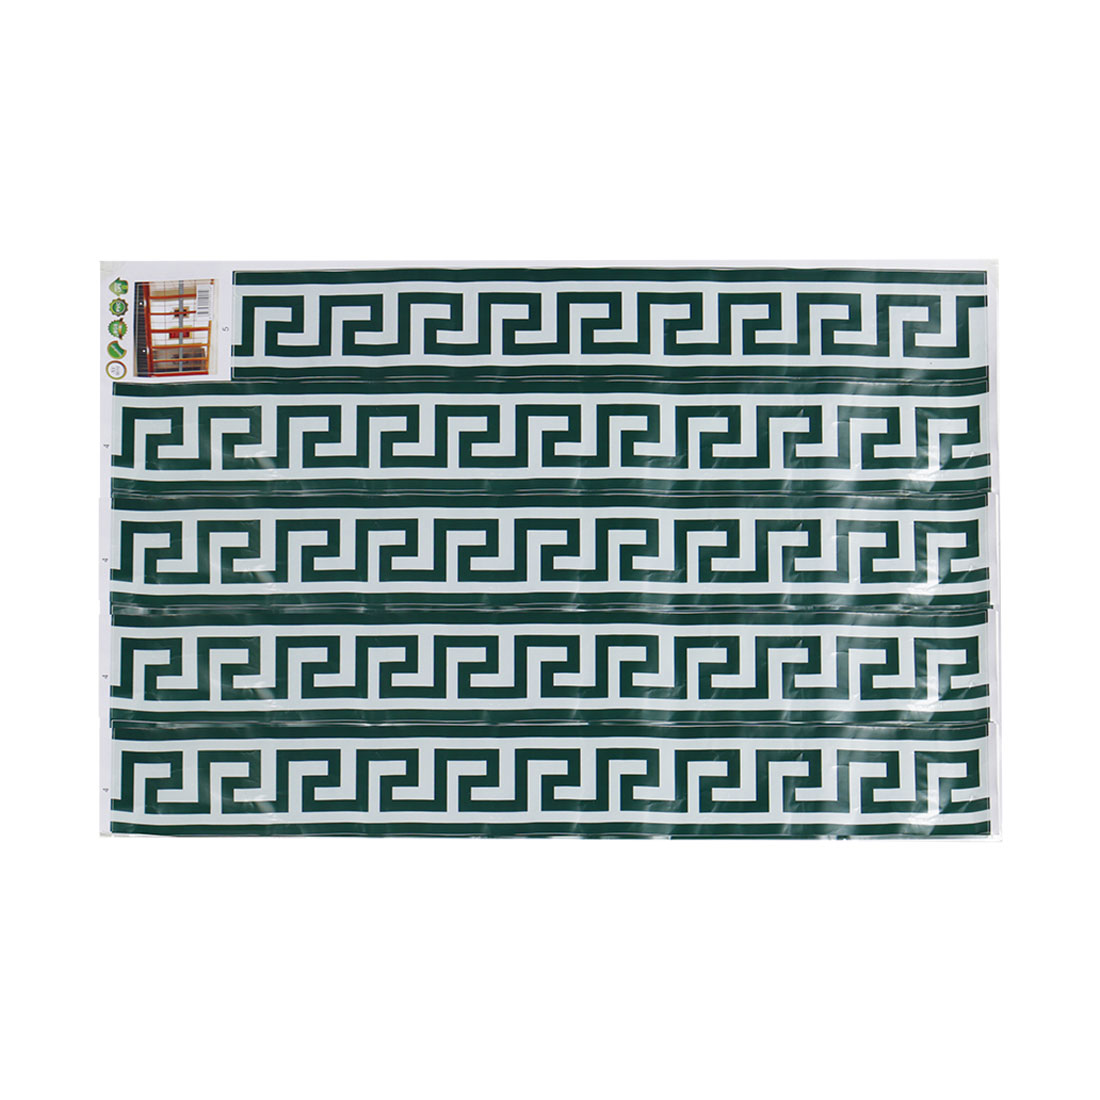 Border Wall Sticker Wall Paper DIY Glass Decals Green Maze Pattern Sticker